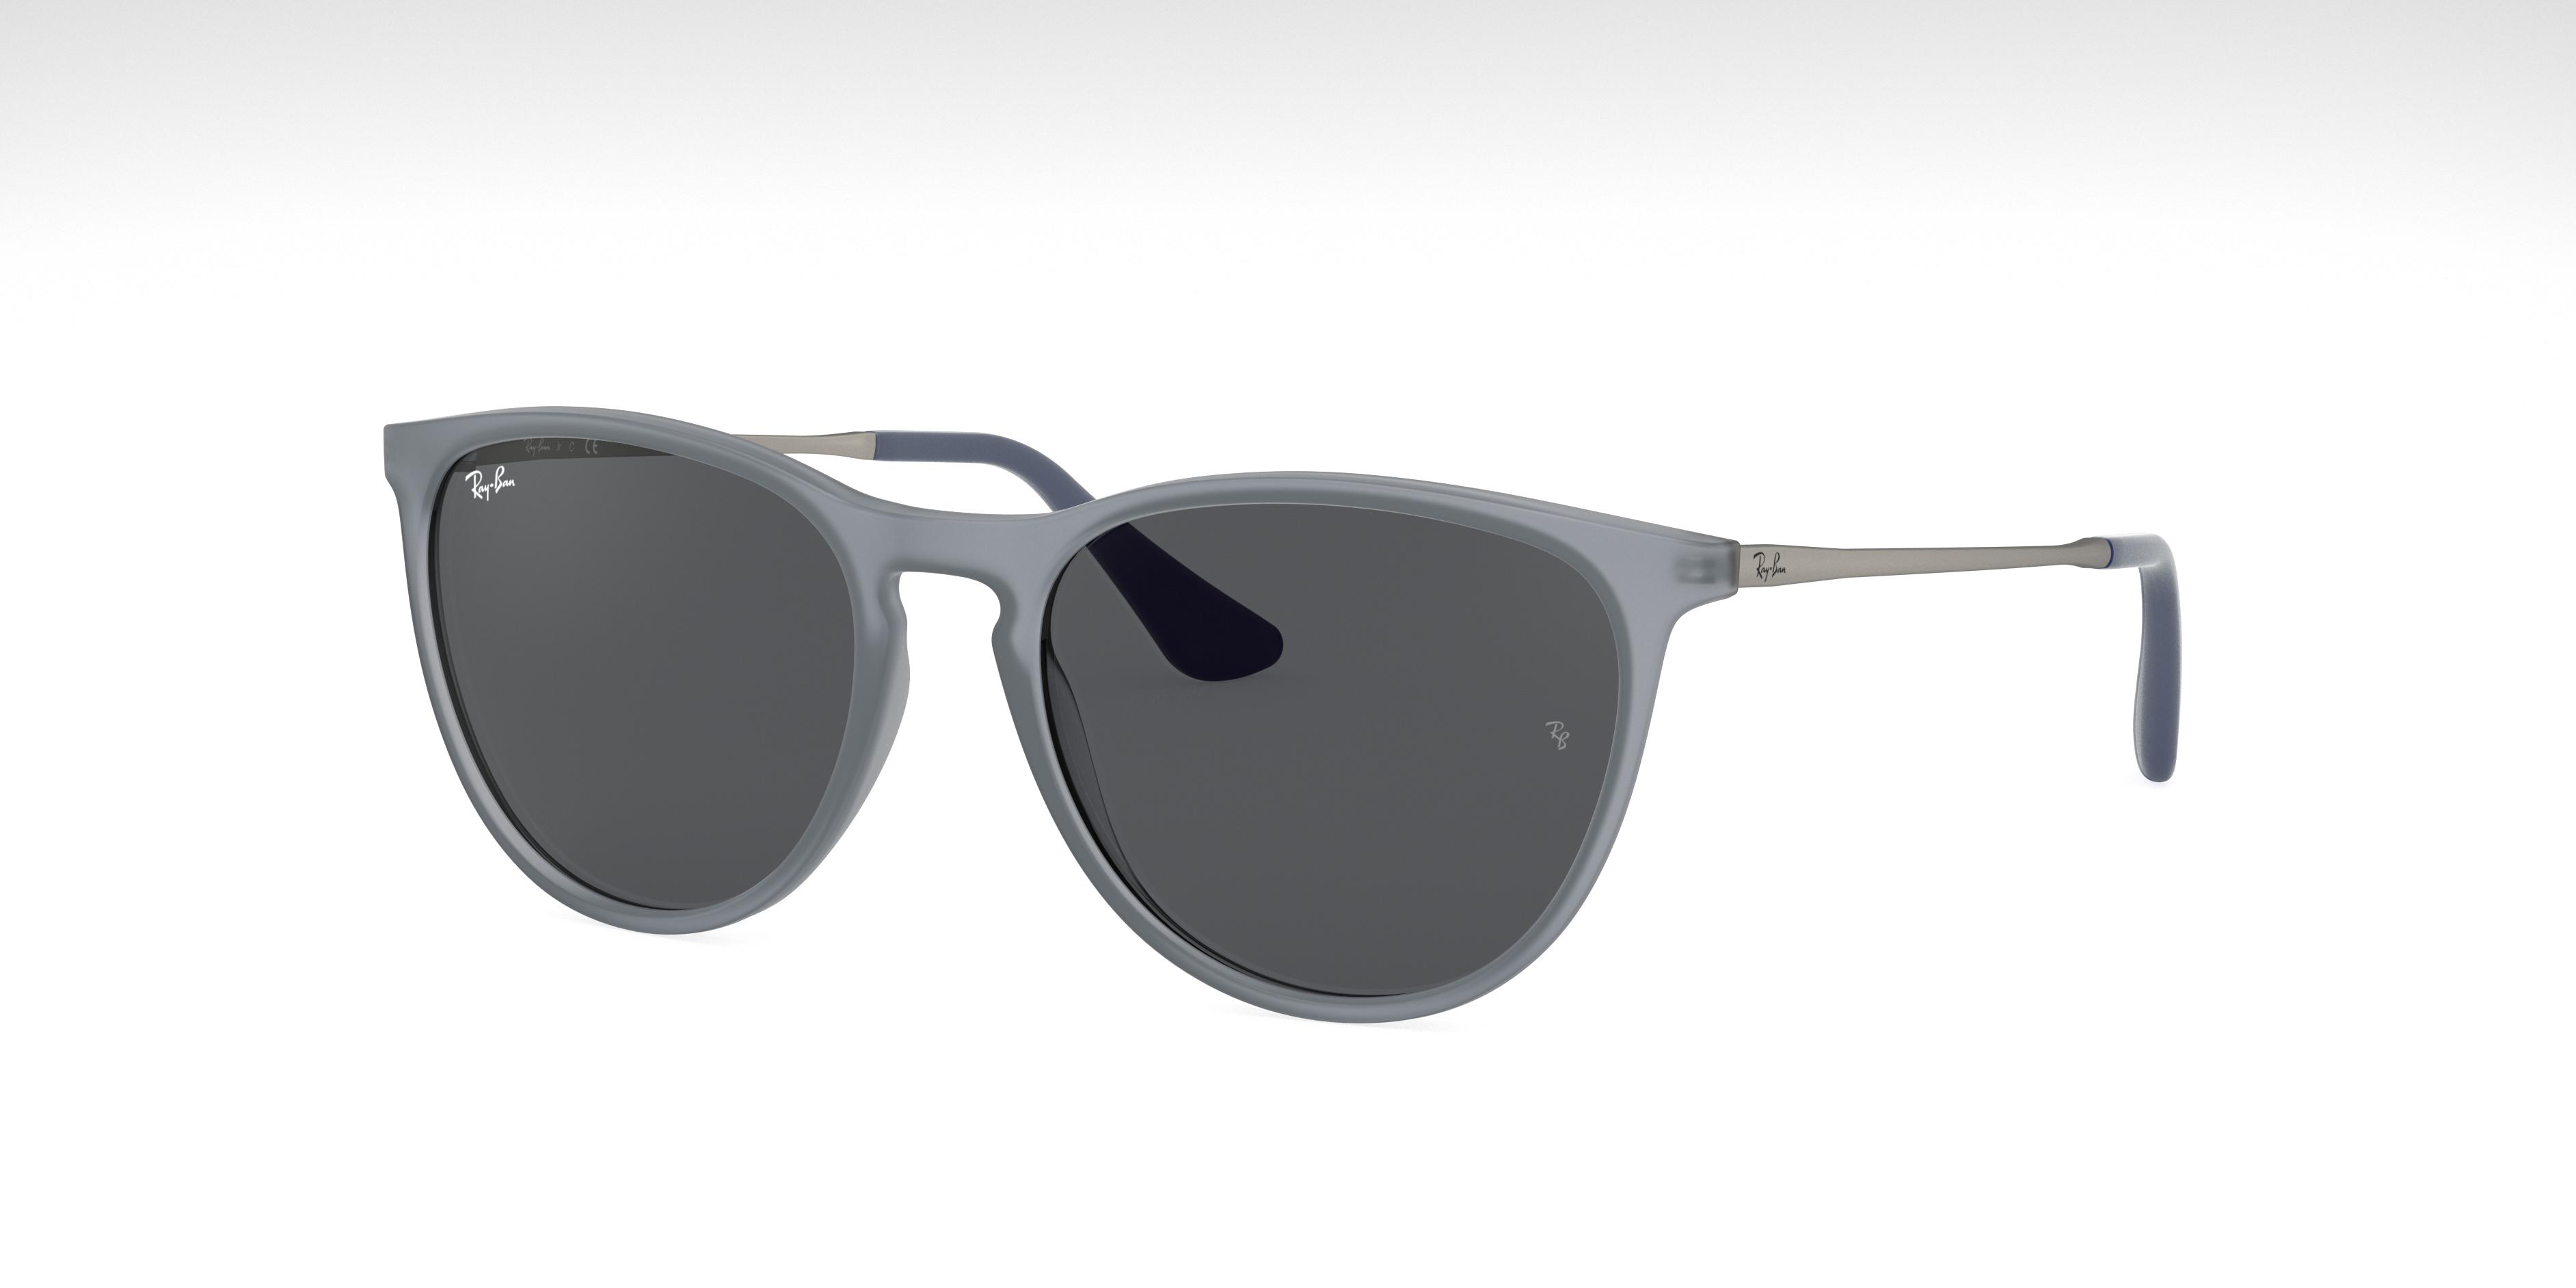 Ray-Ban Izzy Silver, Grey Lenses - RJ9060S